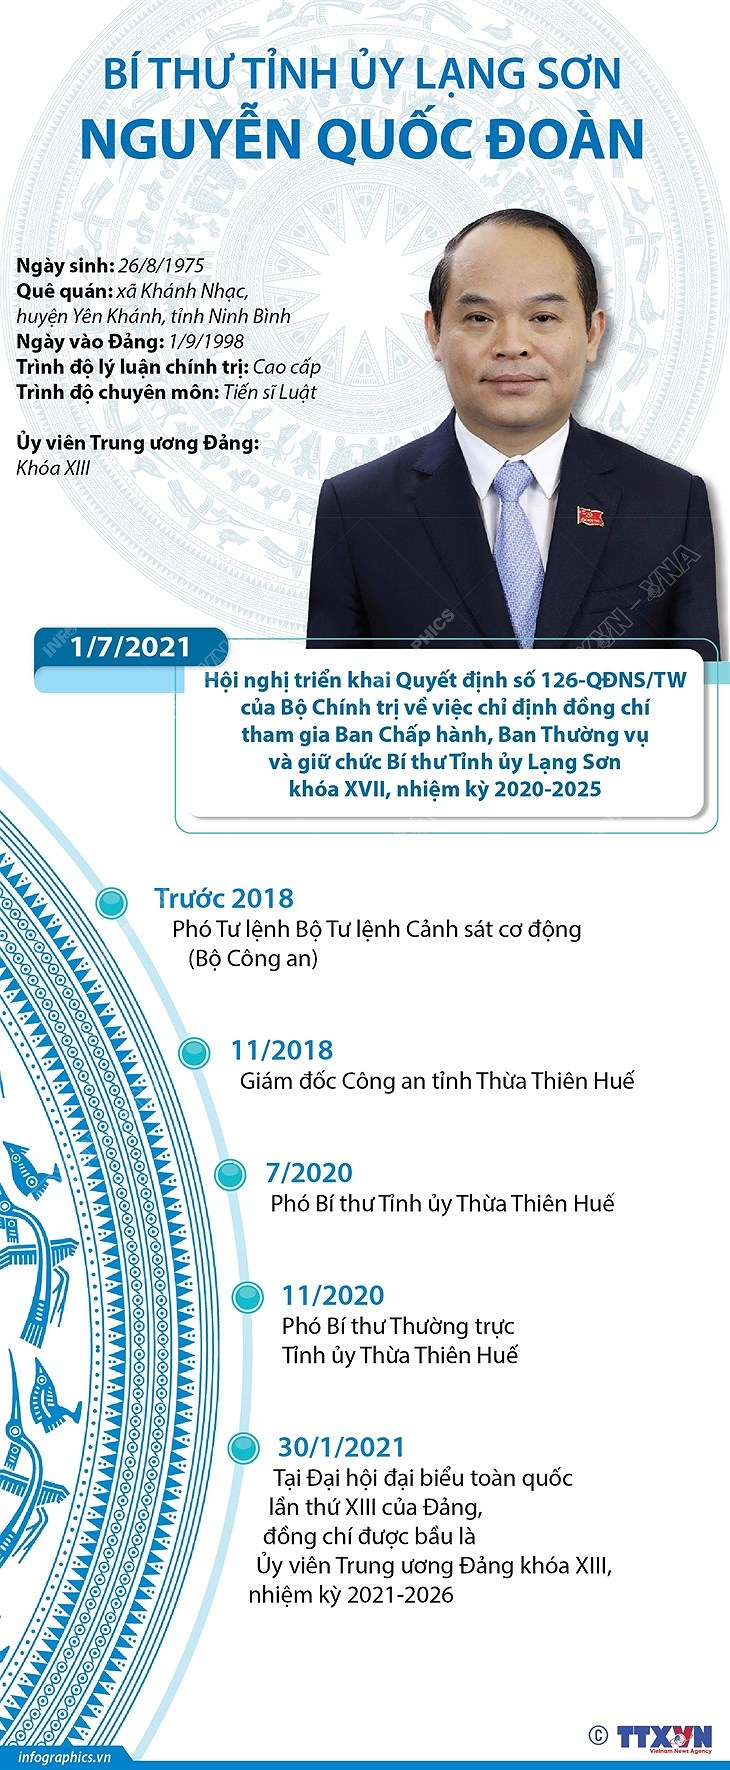 [Infographics] Bi thu Tinh uy Lang Son Nguyen Quoc Doan hinh anh 1